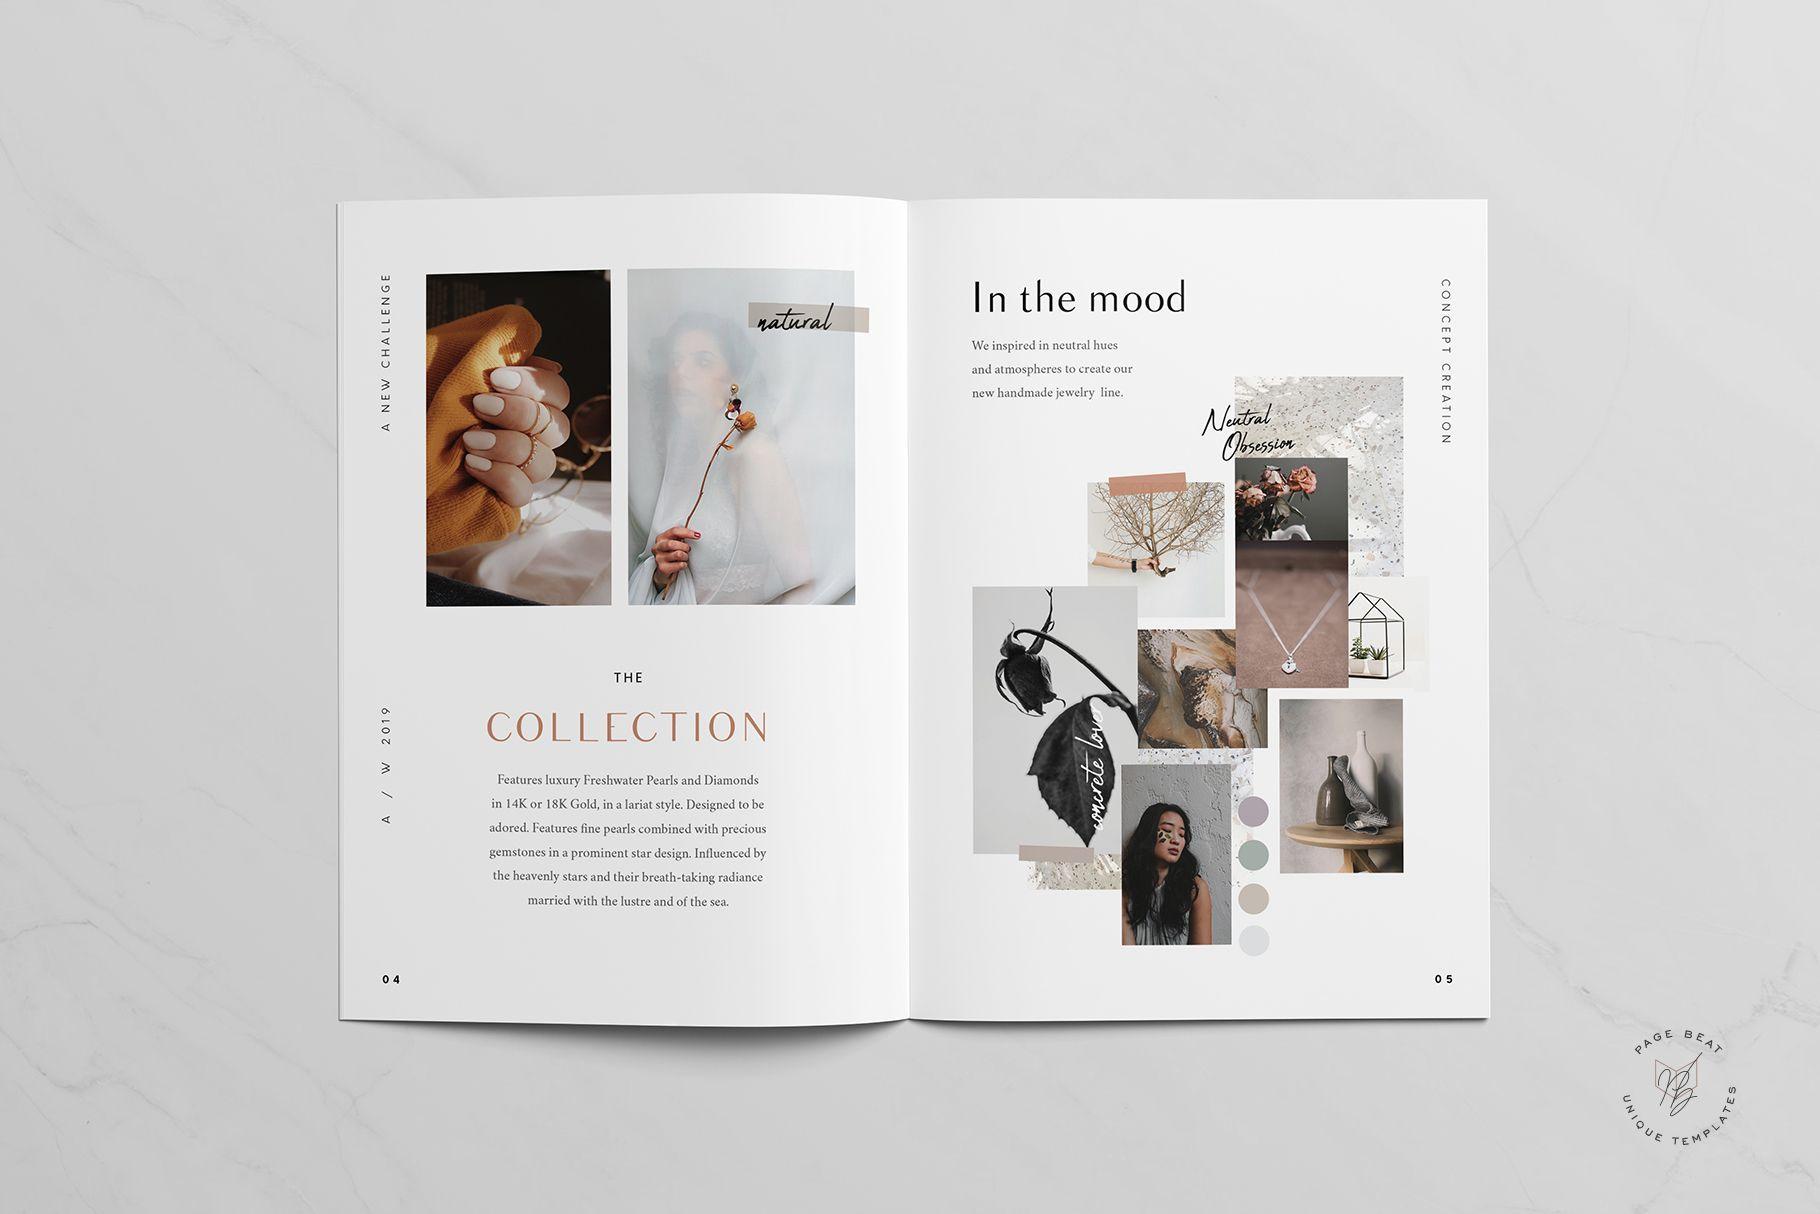 Jewelry Lookbook Jewelry Catalog Fashion Lookbook Brochure Design Template Lookbook In 2020 Jewelry Lookbook Jewelry Catalog Fashion Lookbook